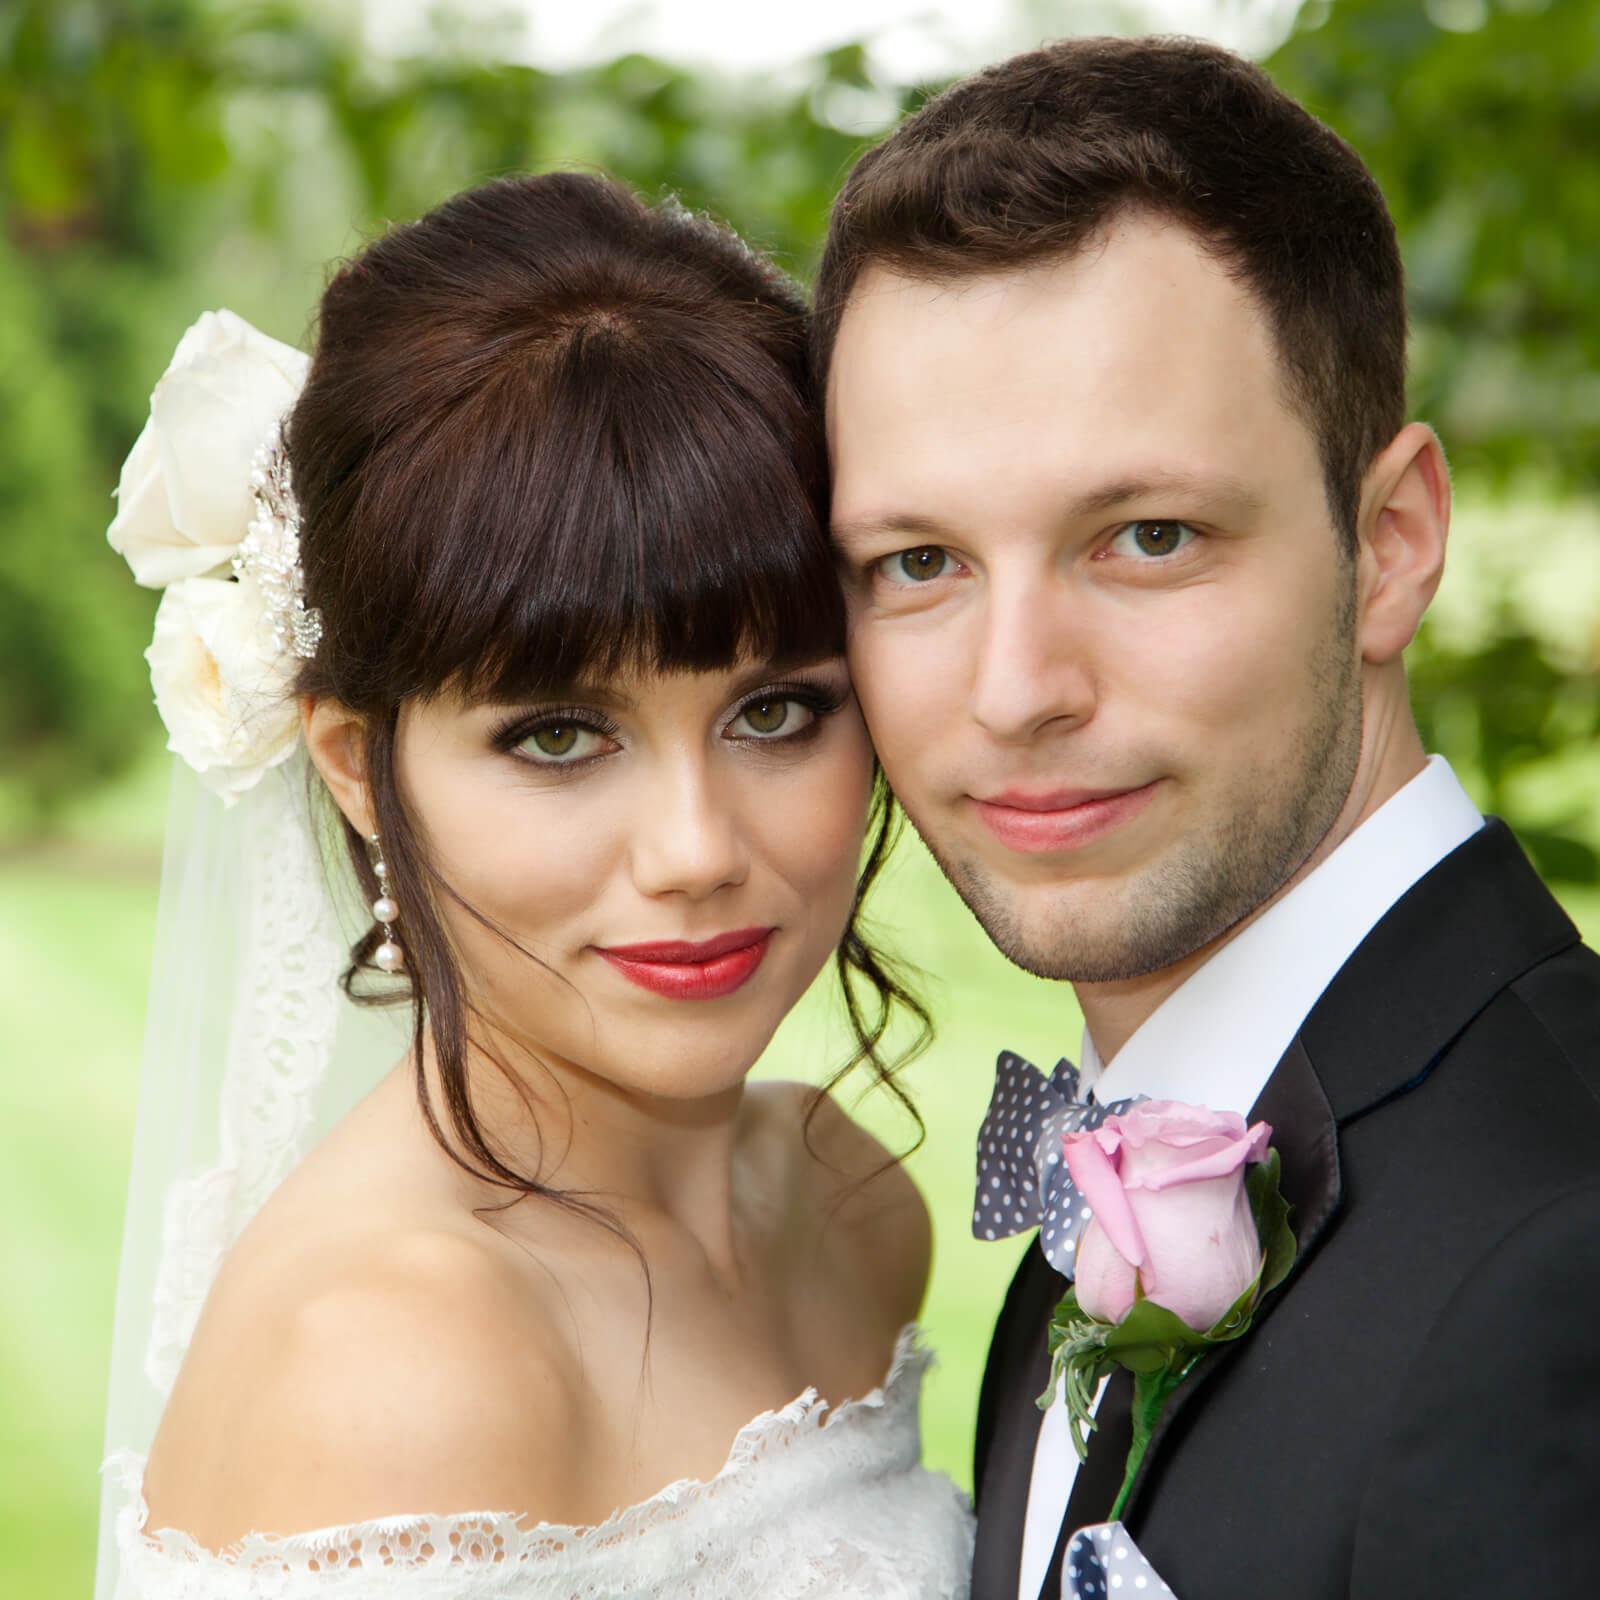 Warwickshire-wedding-photographer-5